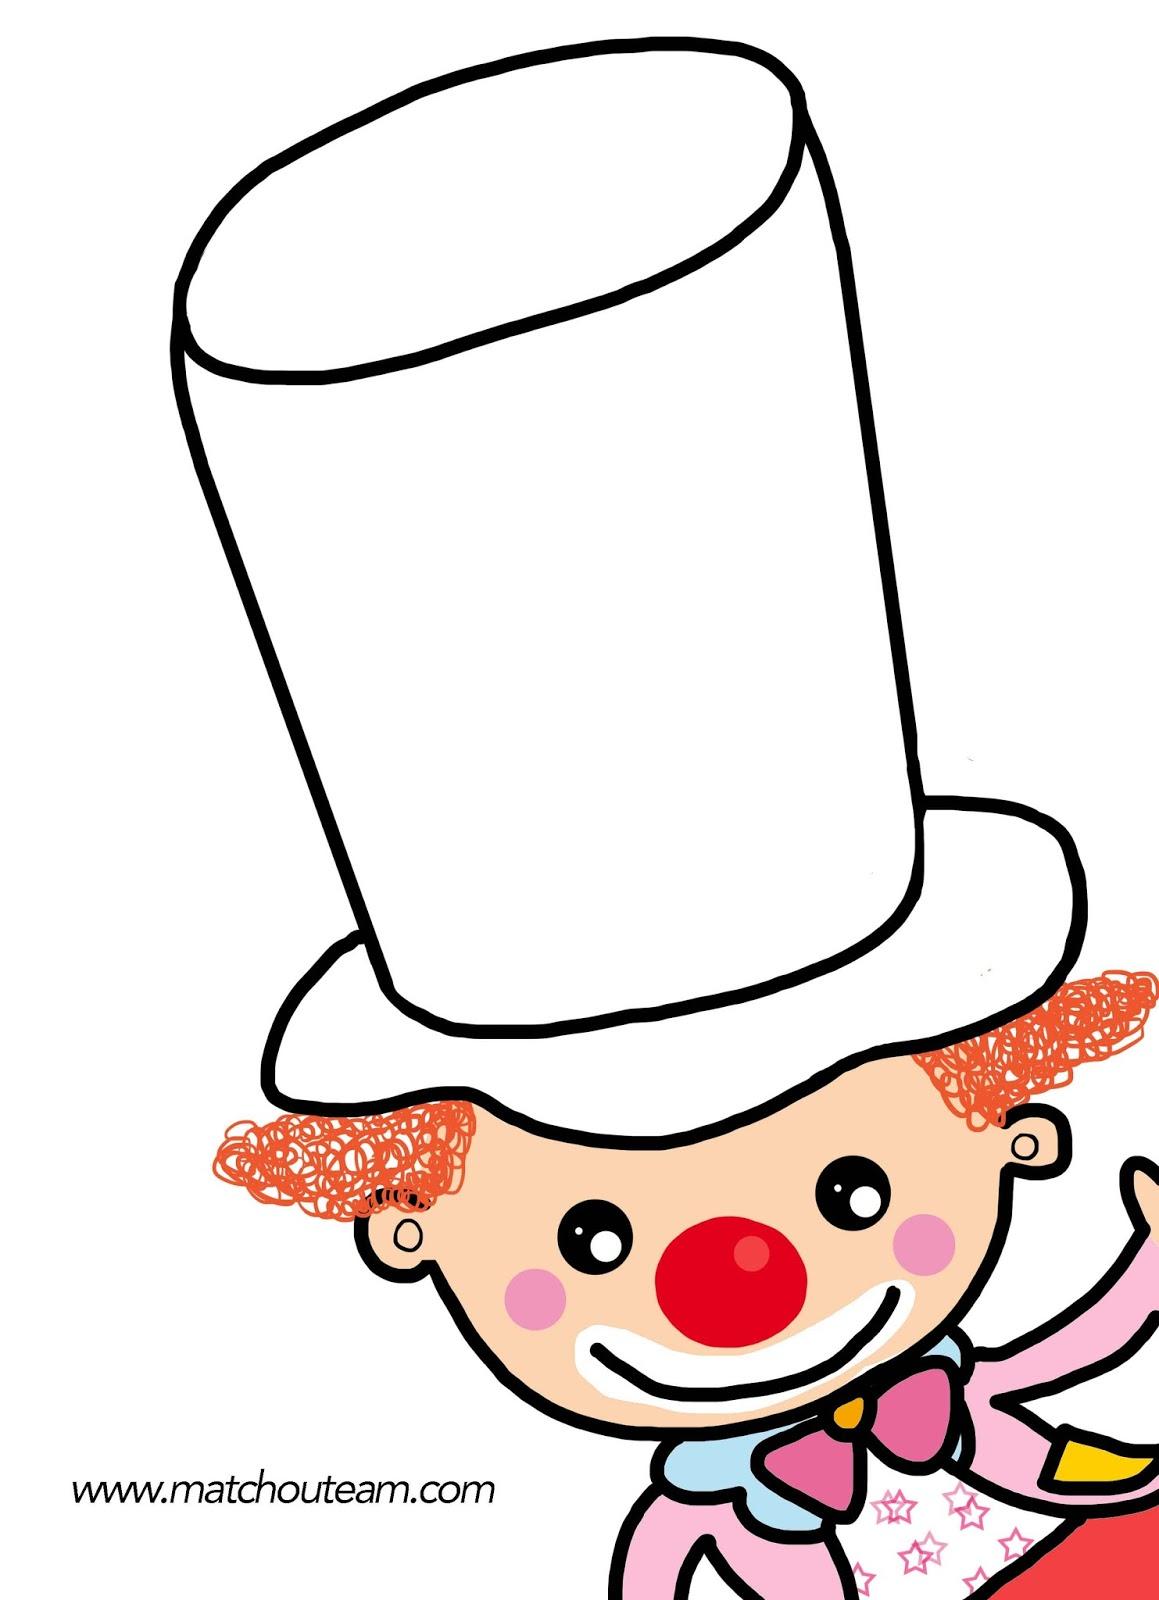 Coloriage Carnaval Maternelle | Liberate à Masque Carnaval Maternelle À Imprimer